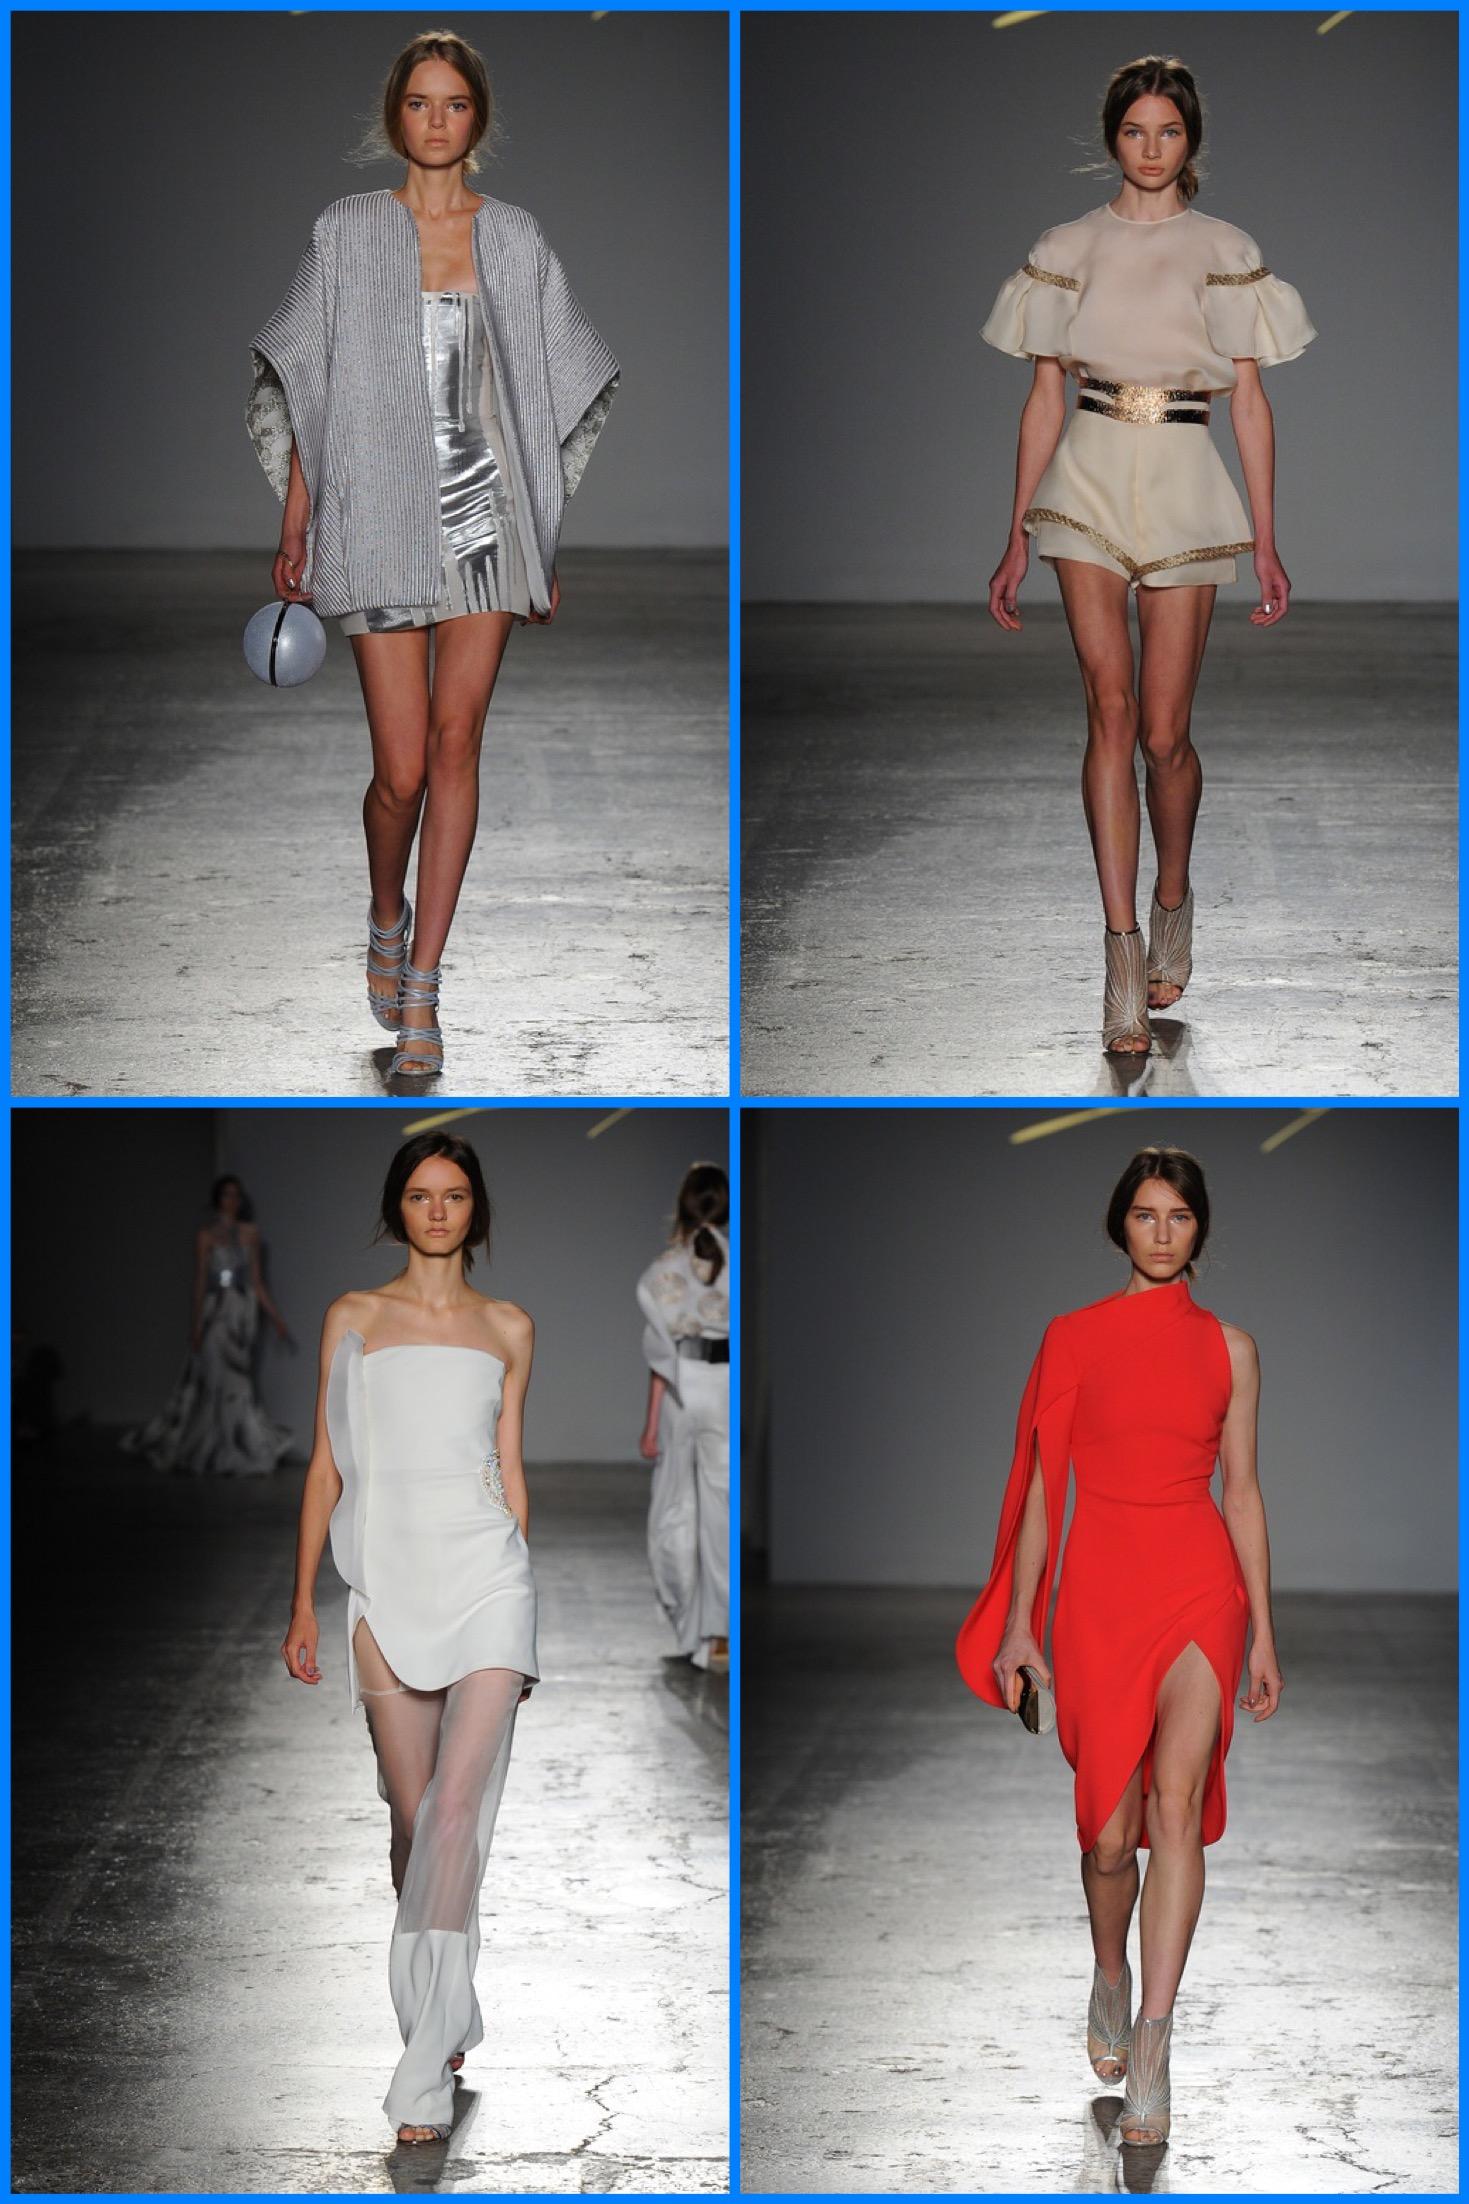 milano-fashion-week-pret-a-porter-spring-summer-2017-style-genny